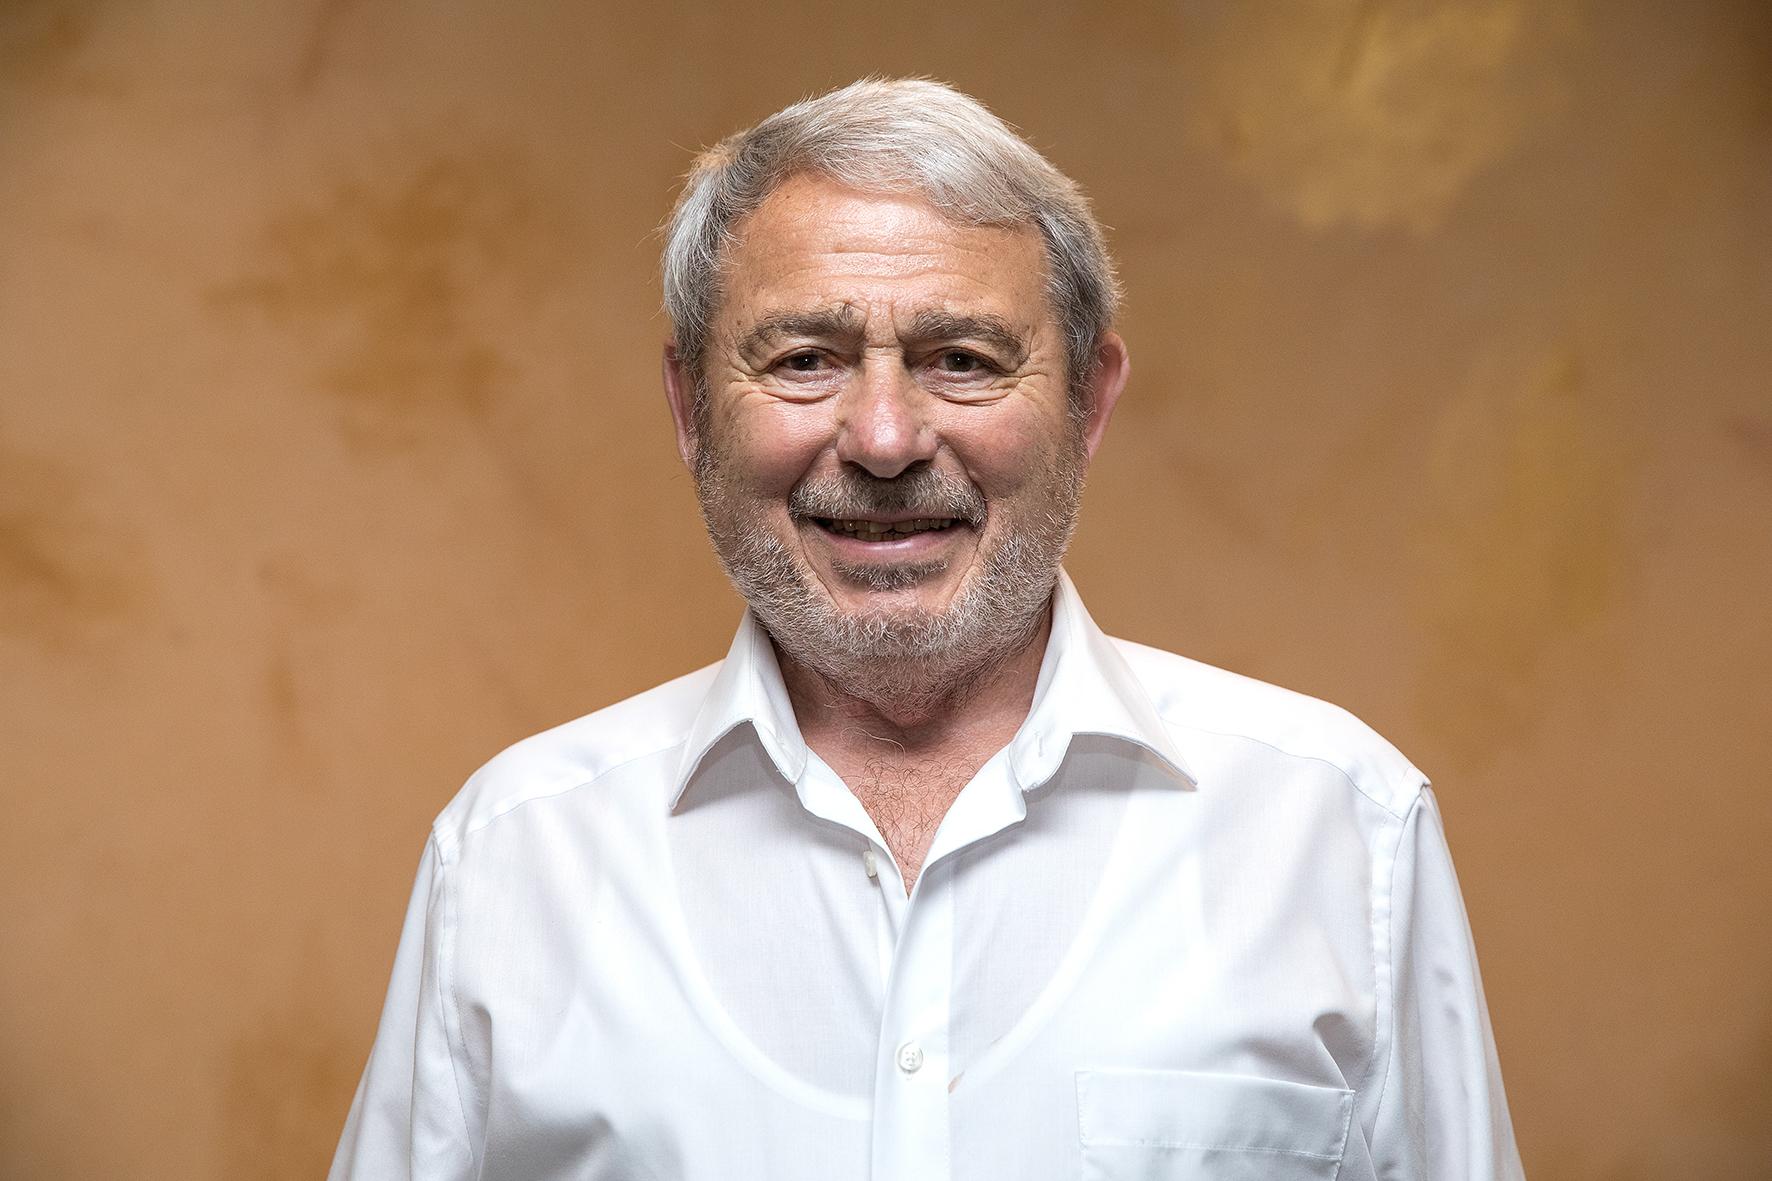 Heinz Otto Bovensmann